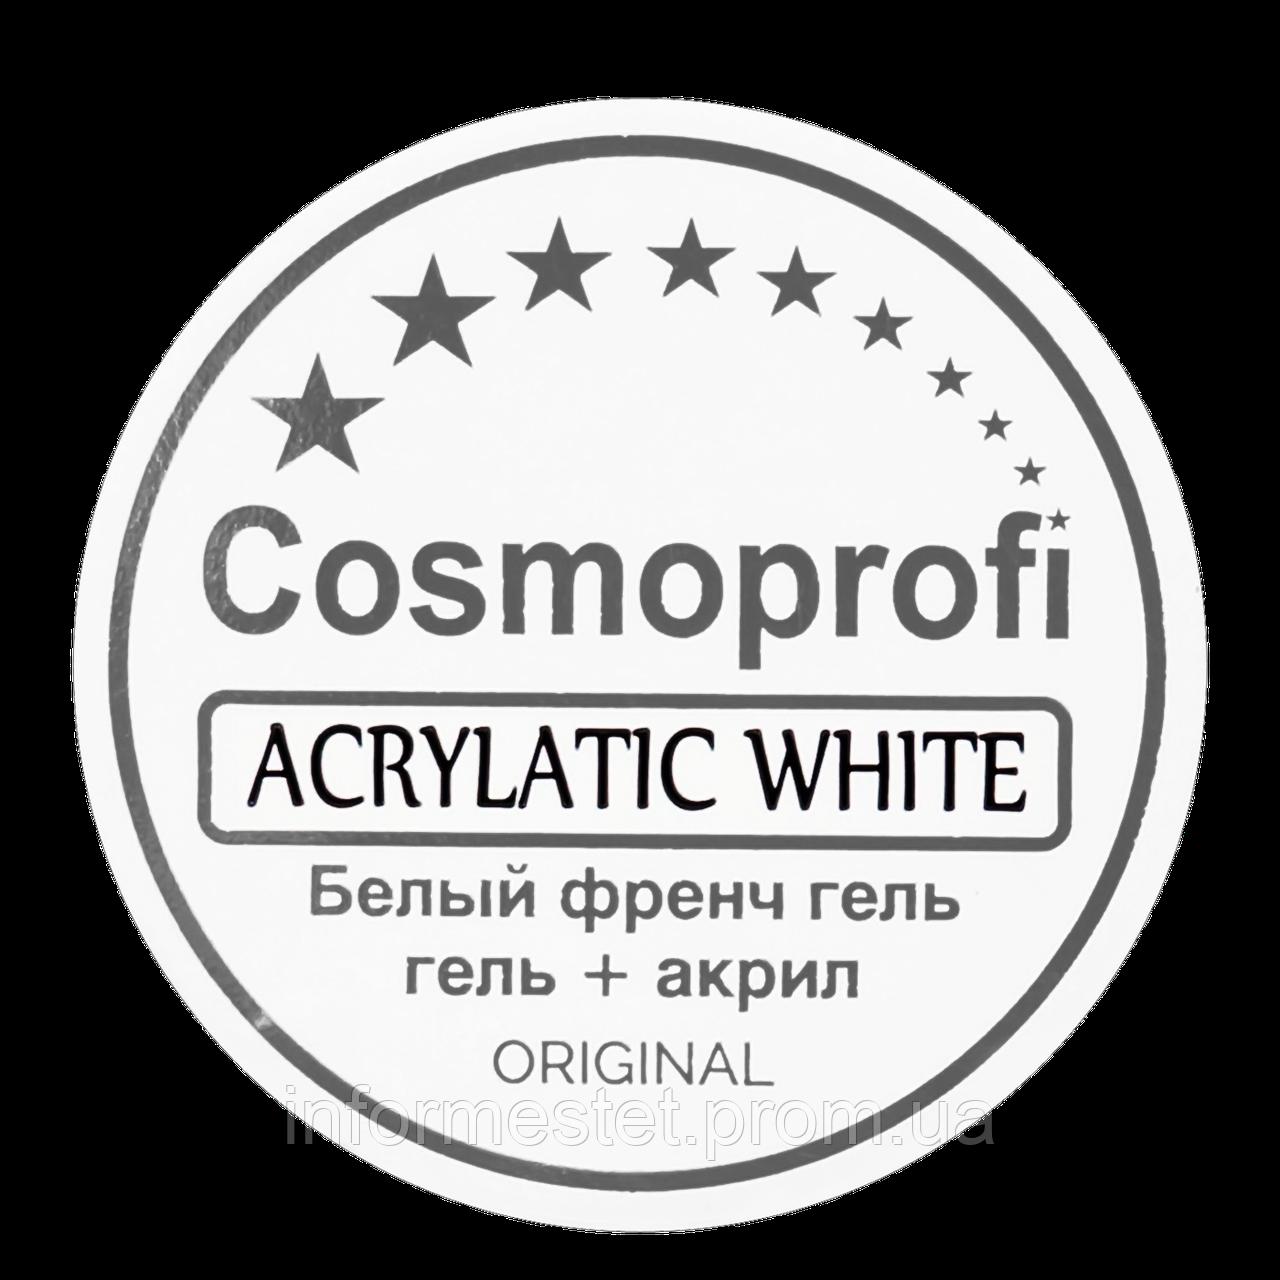 Cosmoprofi Acrylatic  White 15g